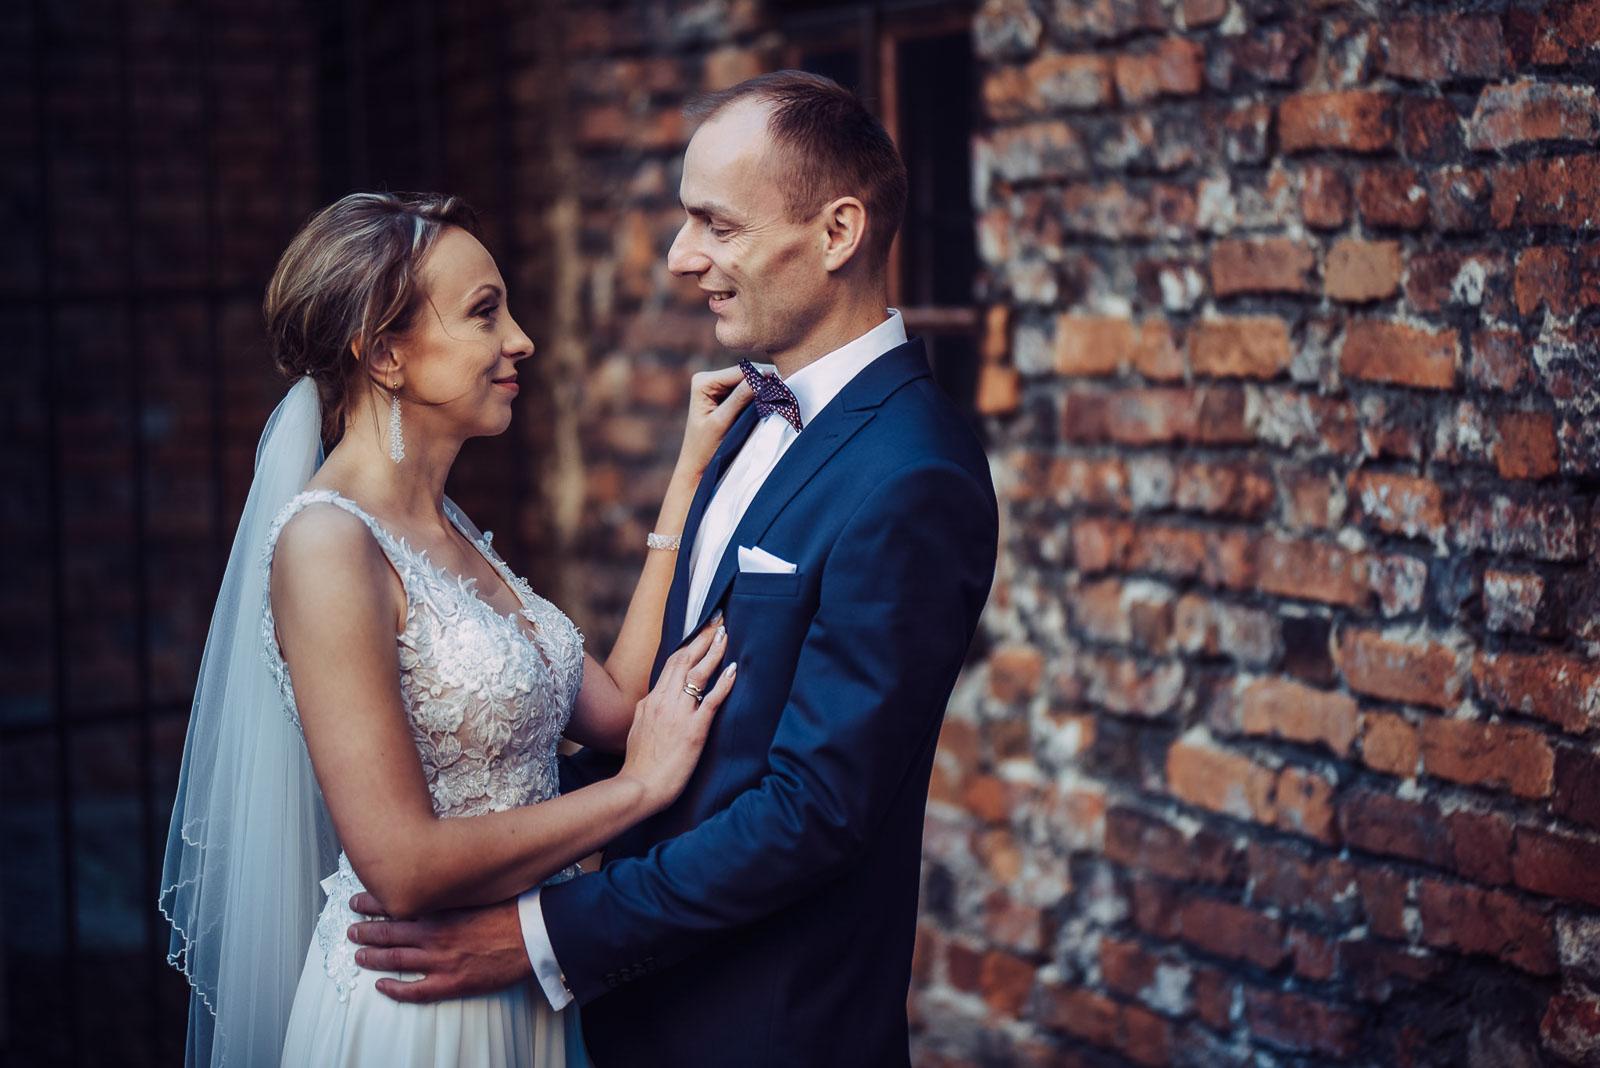 Beata i Janusz